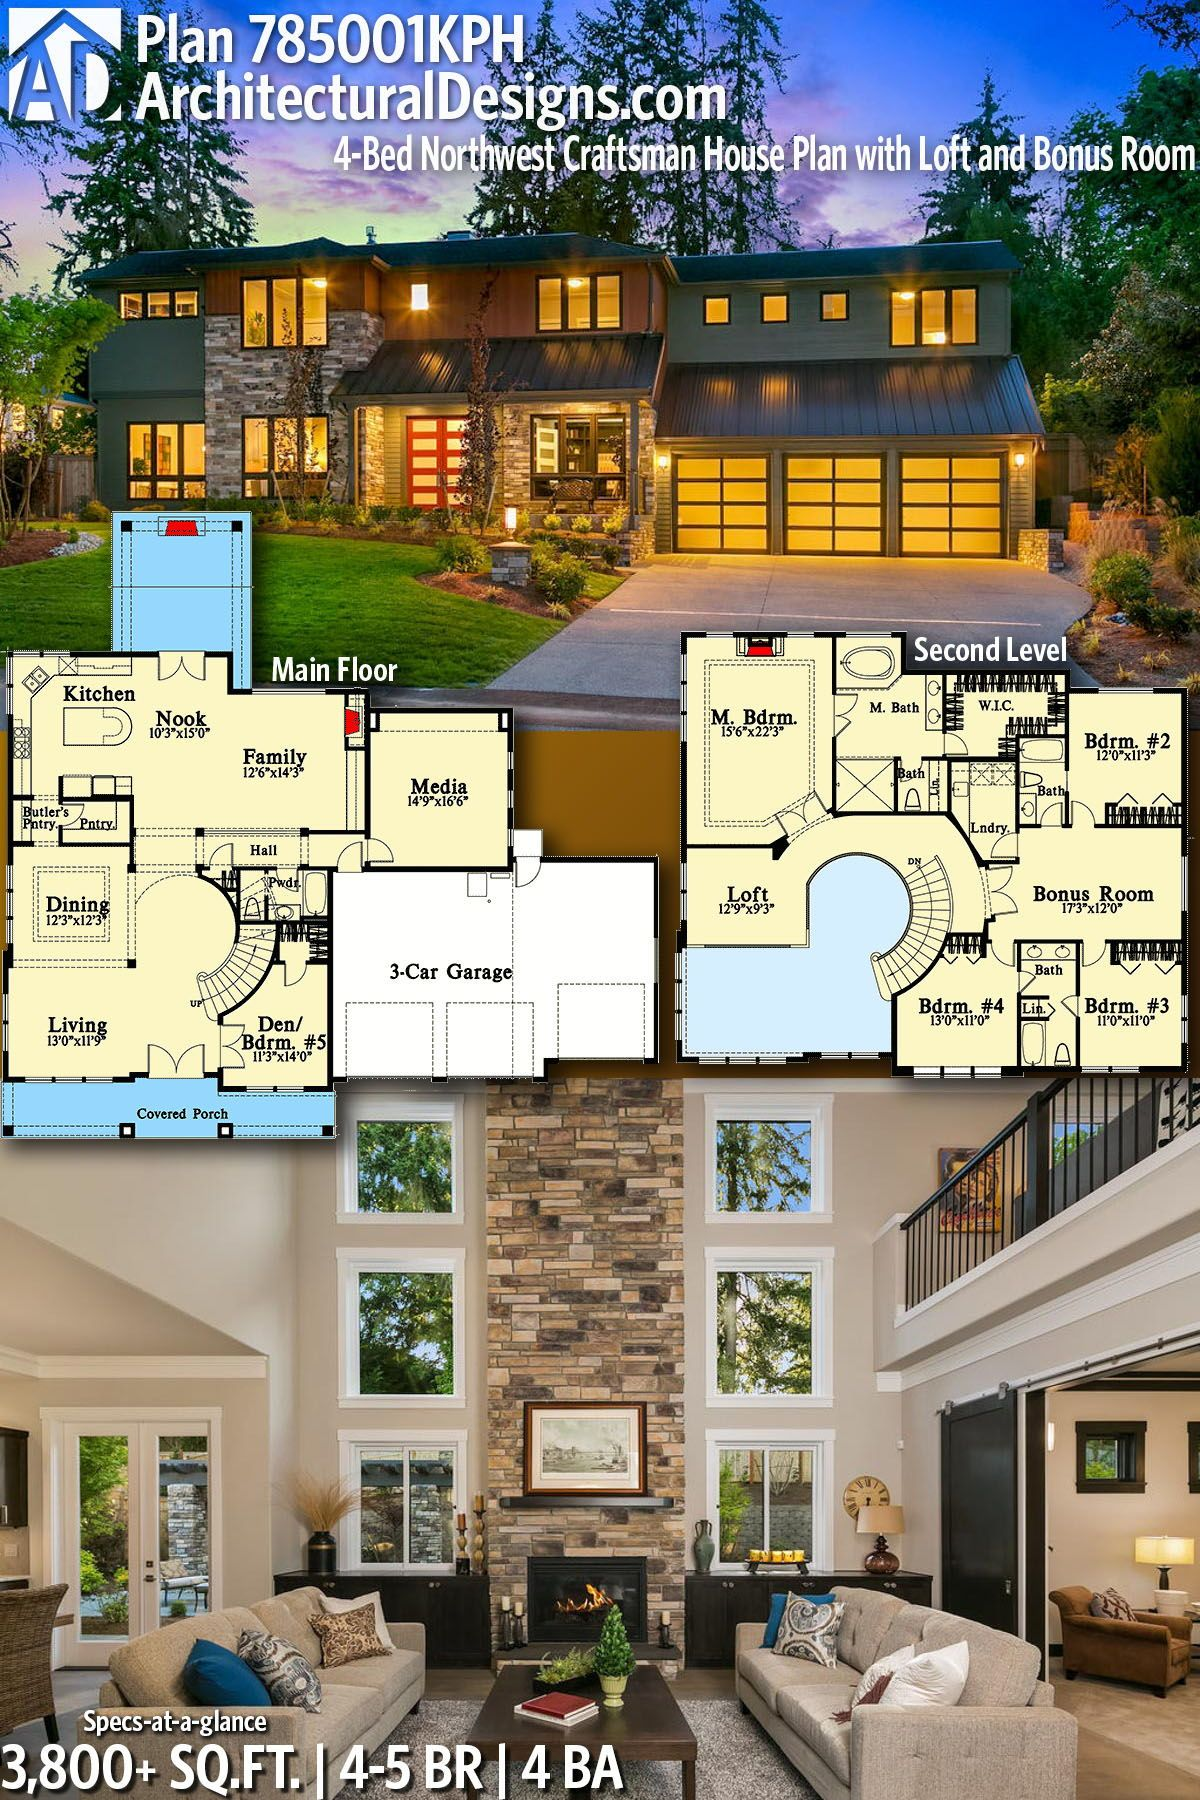 Plan 785001KPH: 4-Bed Northwest Craftsman House Plan with ...